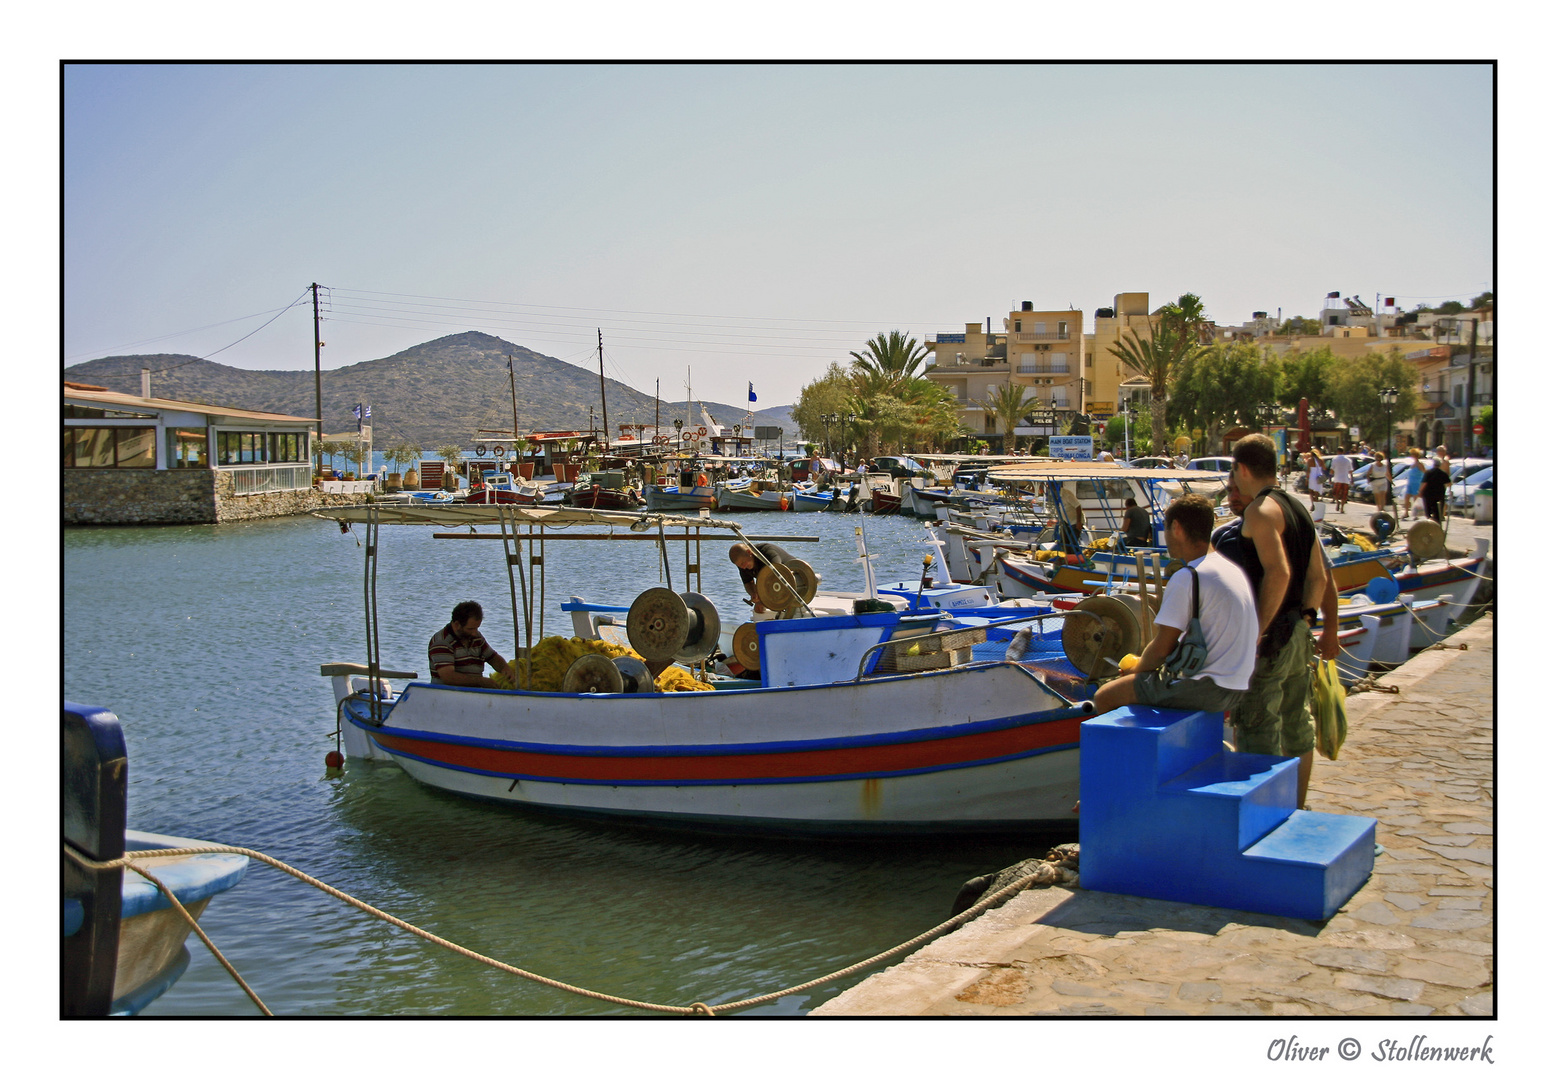 Hafenszene auf Kreta